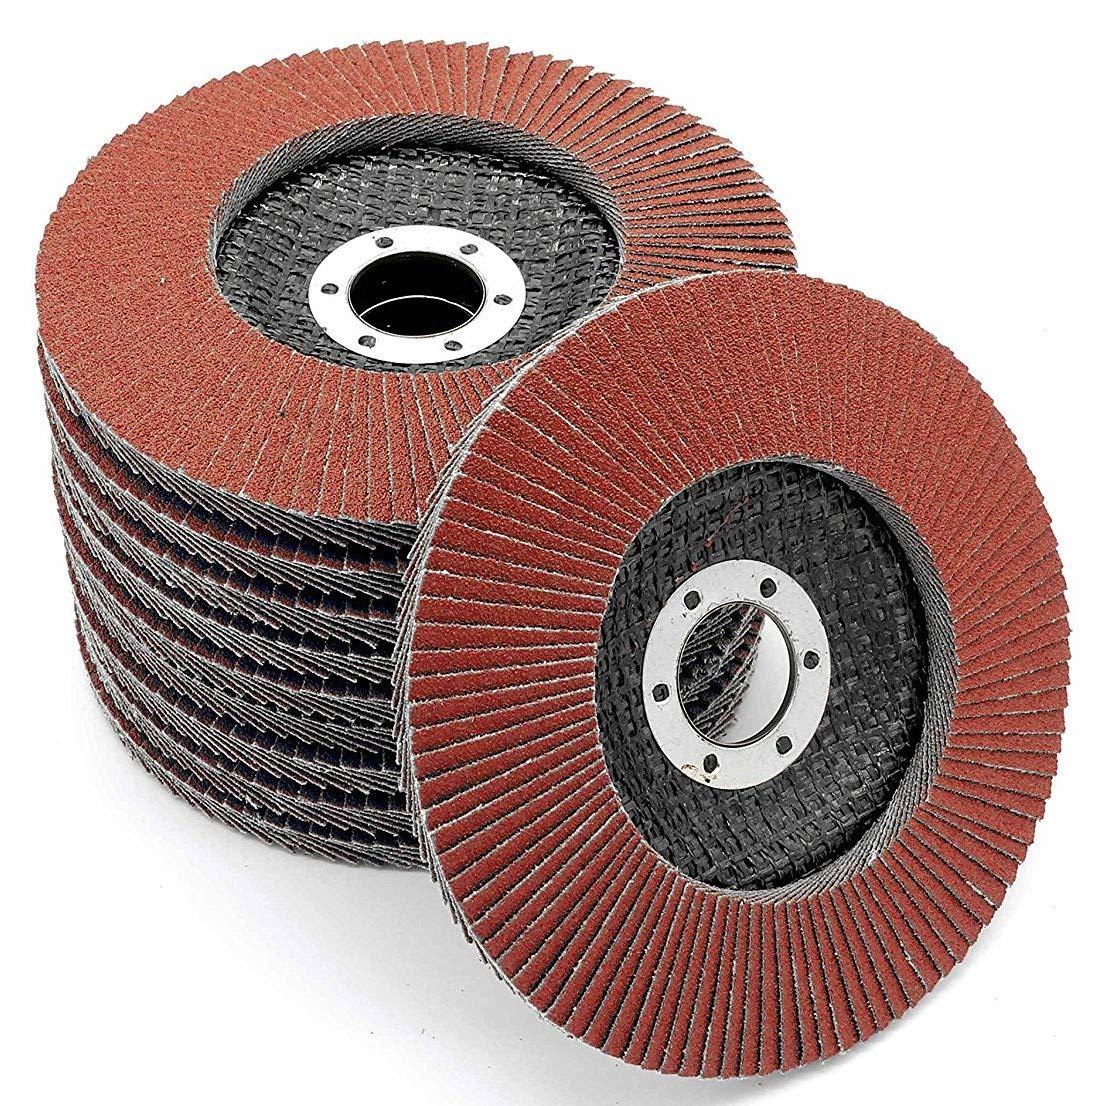 Pack of 10, Serrated Washer 115 mm, 40 Grit, Abrasive Flap Wheel, Abrasive Mop Disc FD-Workstuff